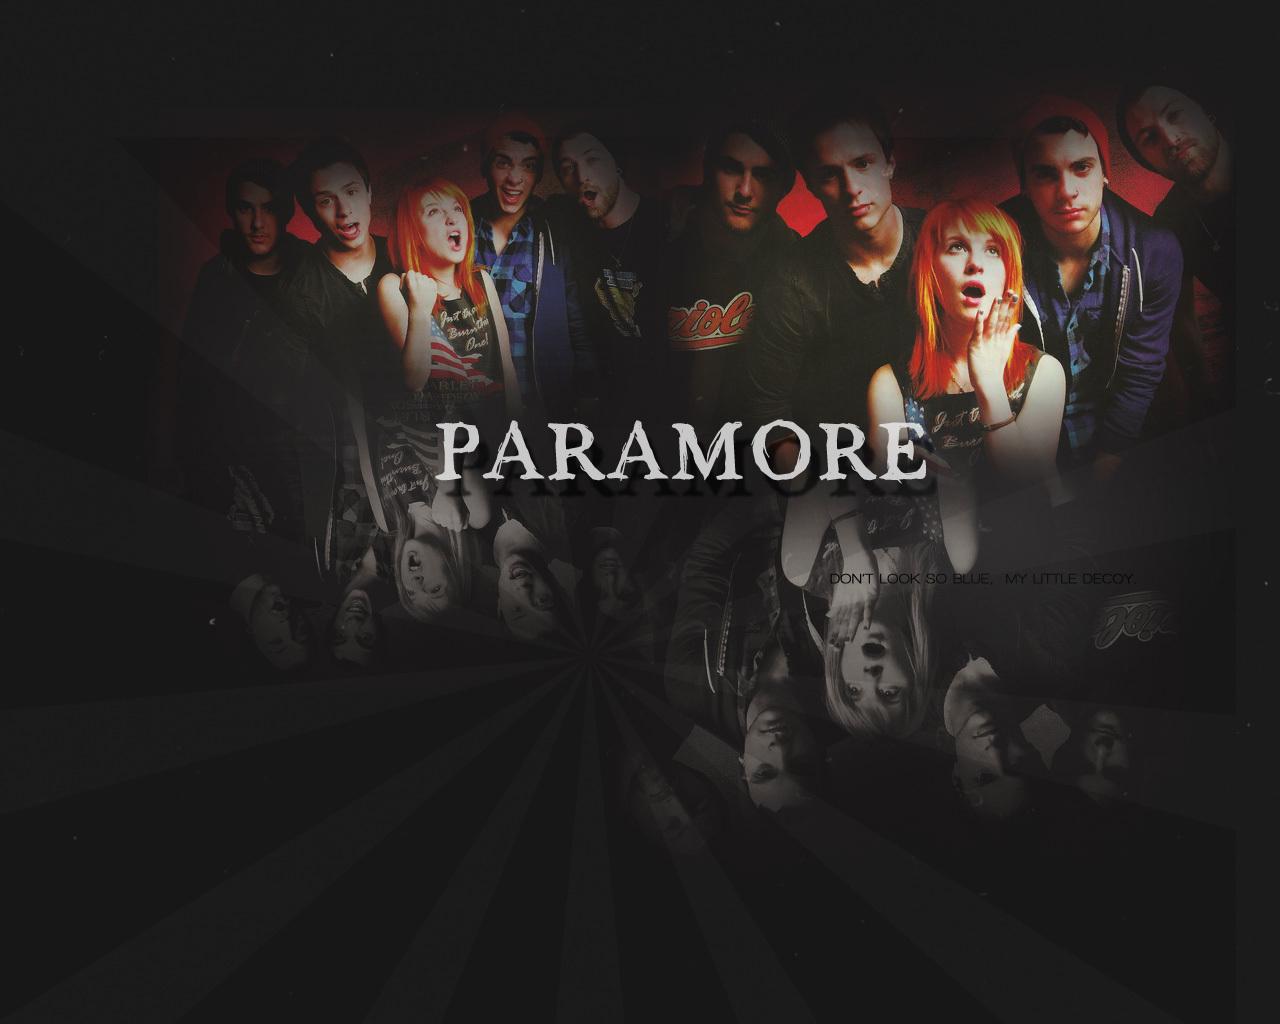 Paramore wallpapers - Paramore Wallpaper (11941456) - Fanpop